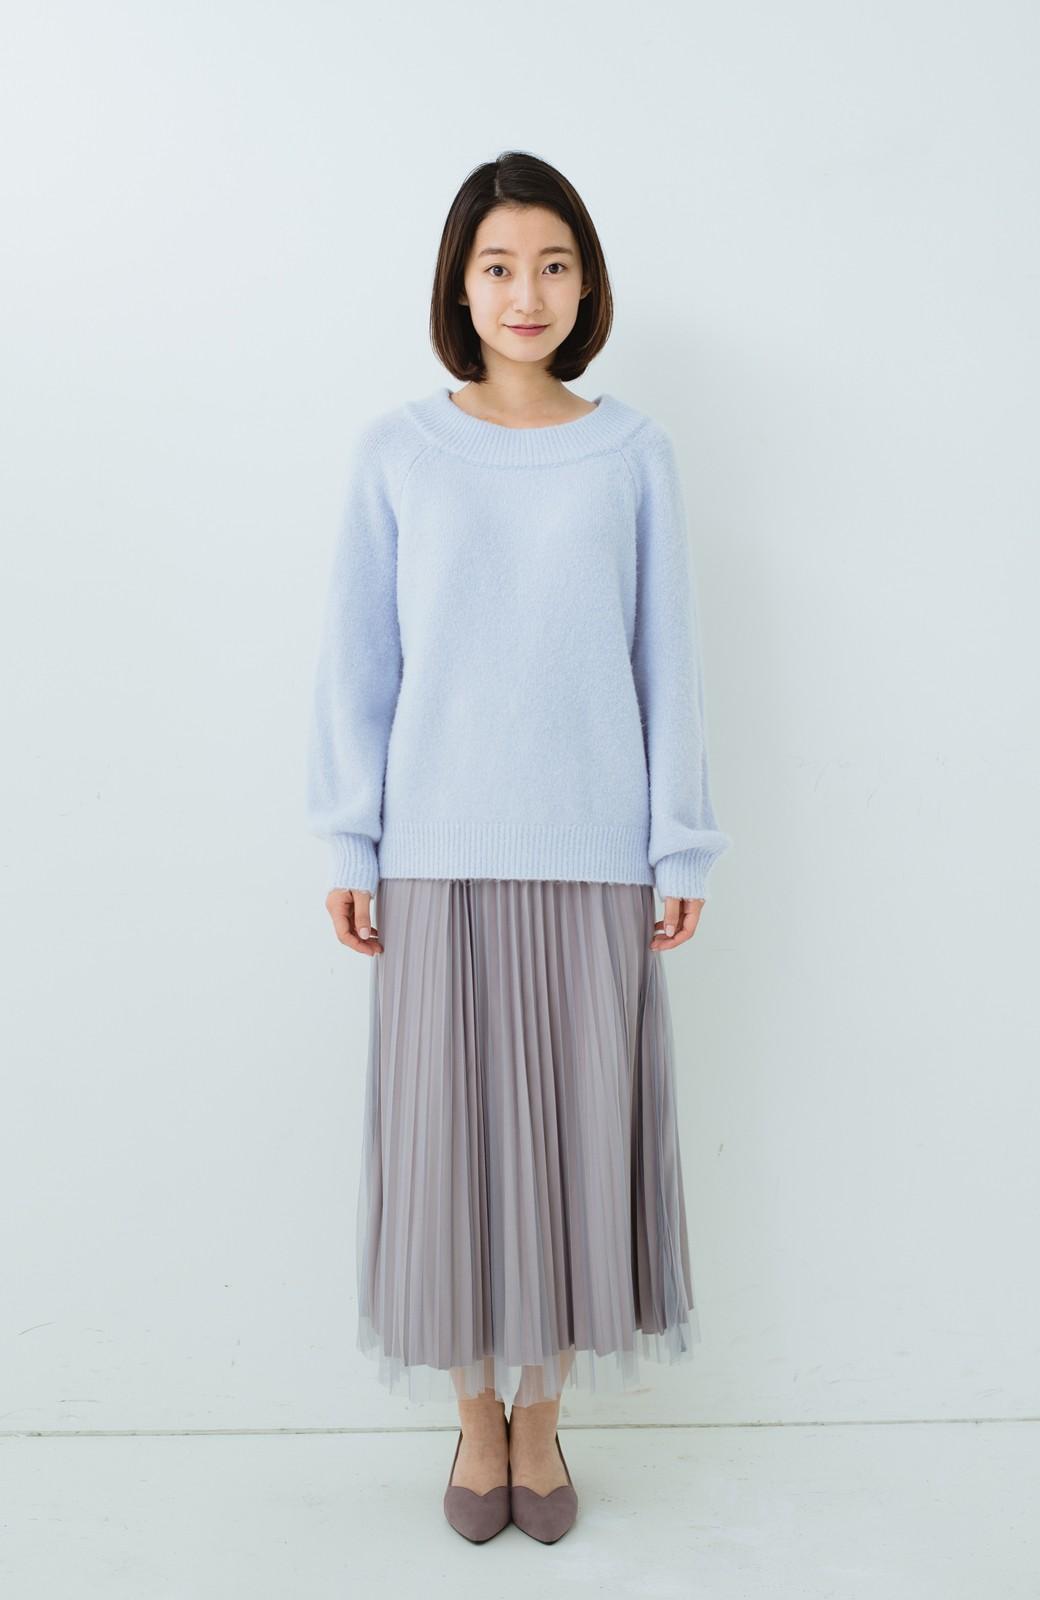 haco! どんな日も華やか気分にしてくれる 二枚仕立てのチュールプリーツスカート <ライトグレー>の商品写真9